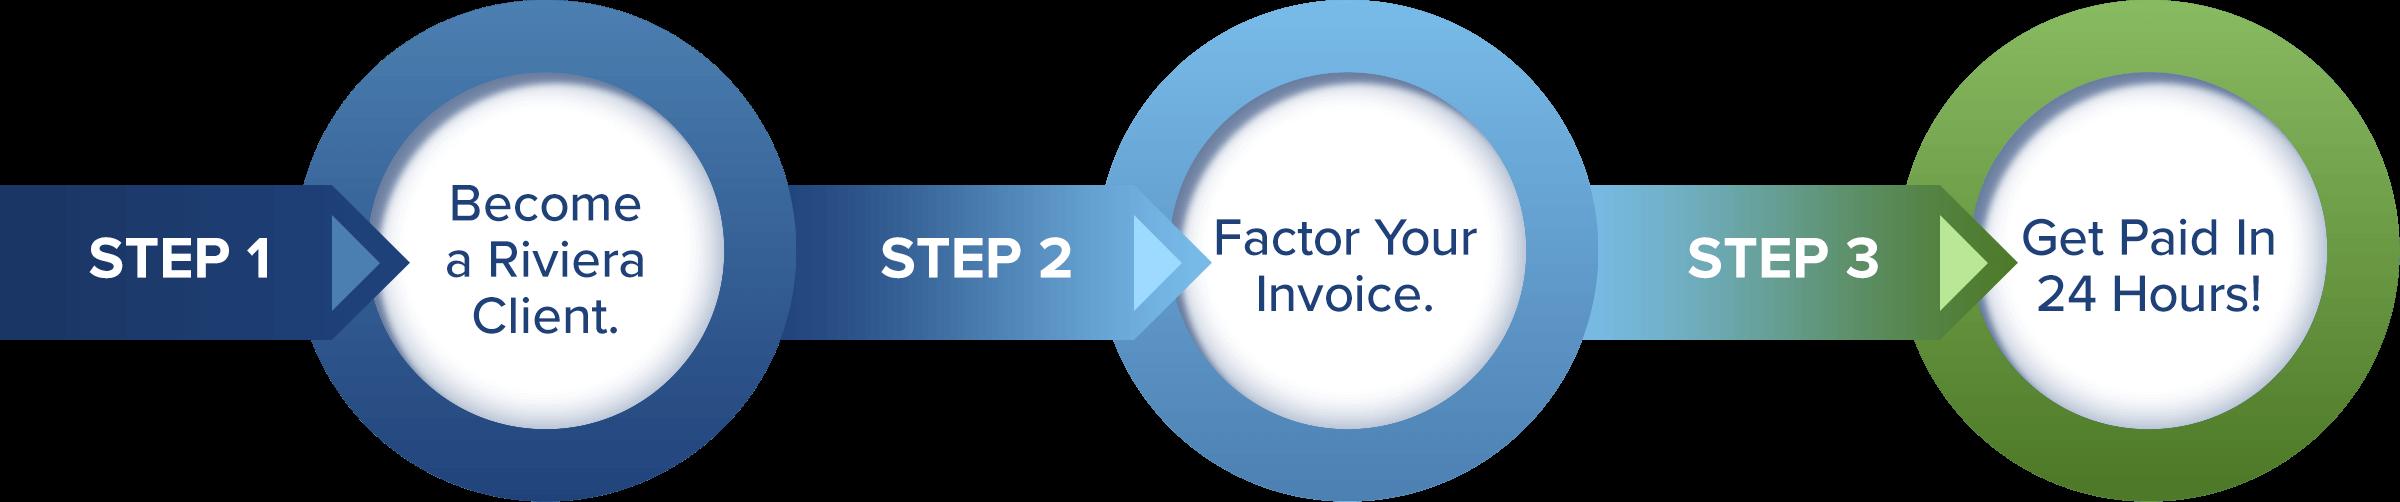 riviera-invoice-factoring-process-2